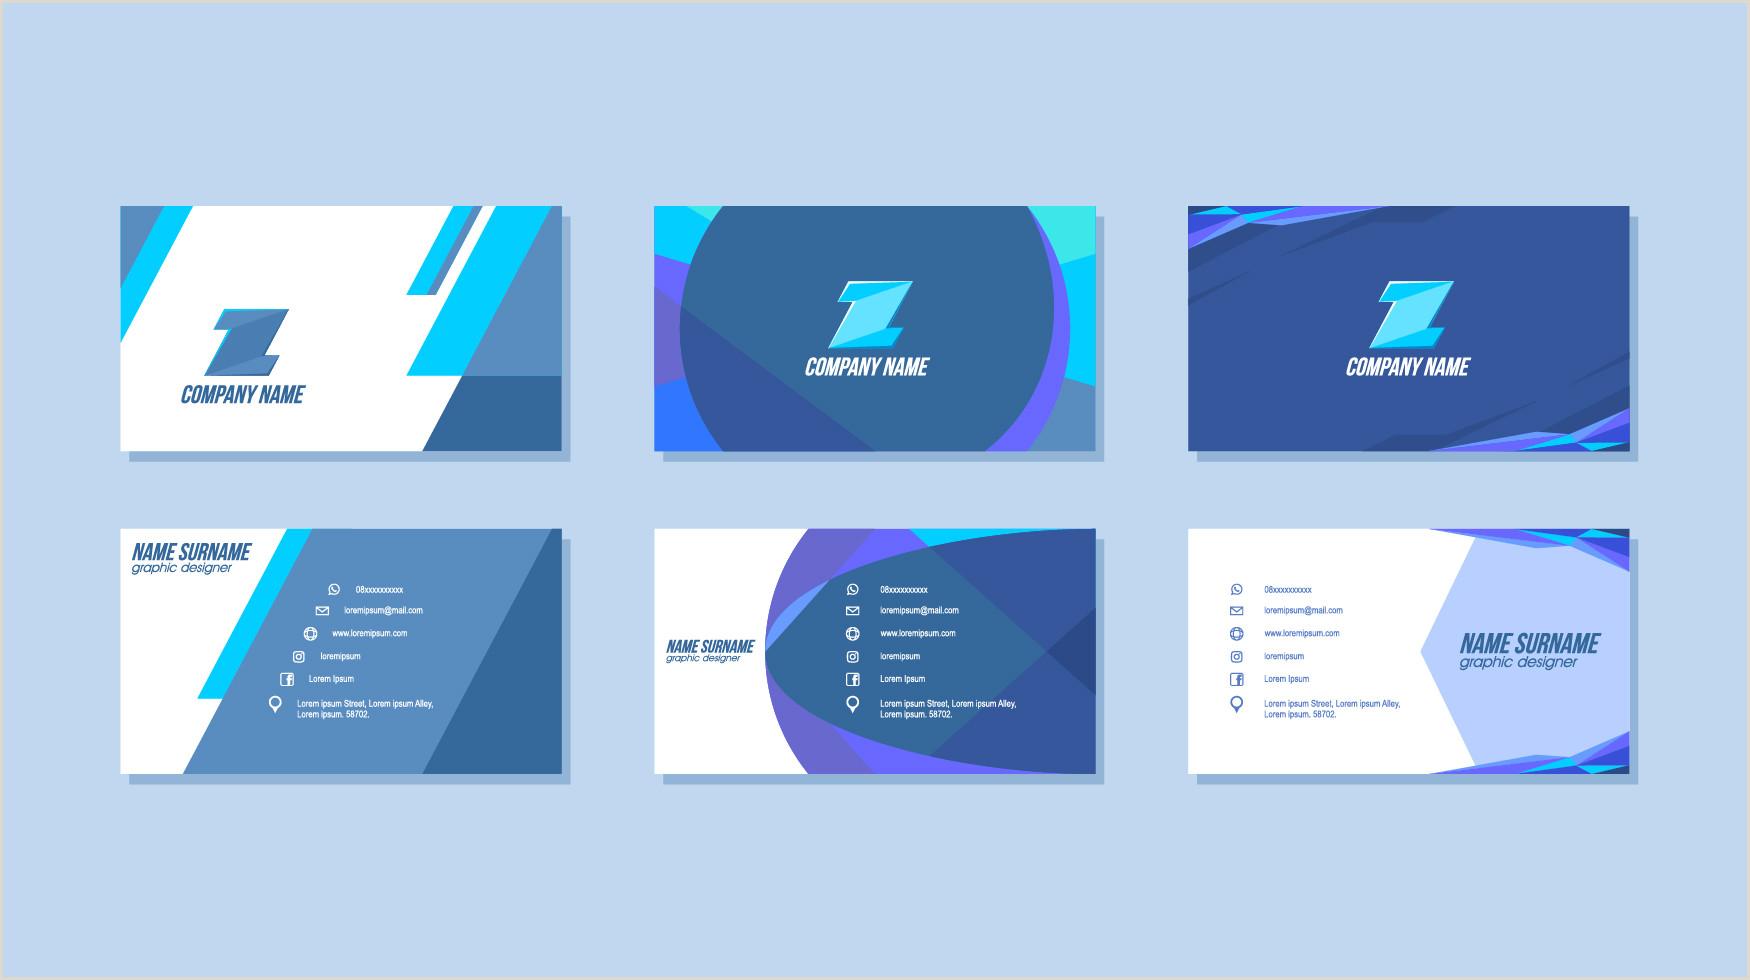 Name Card Sample Name Card Design Free Vector Art 74 462 Free Downloads